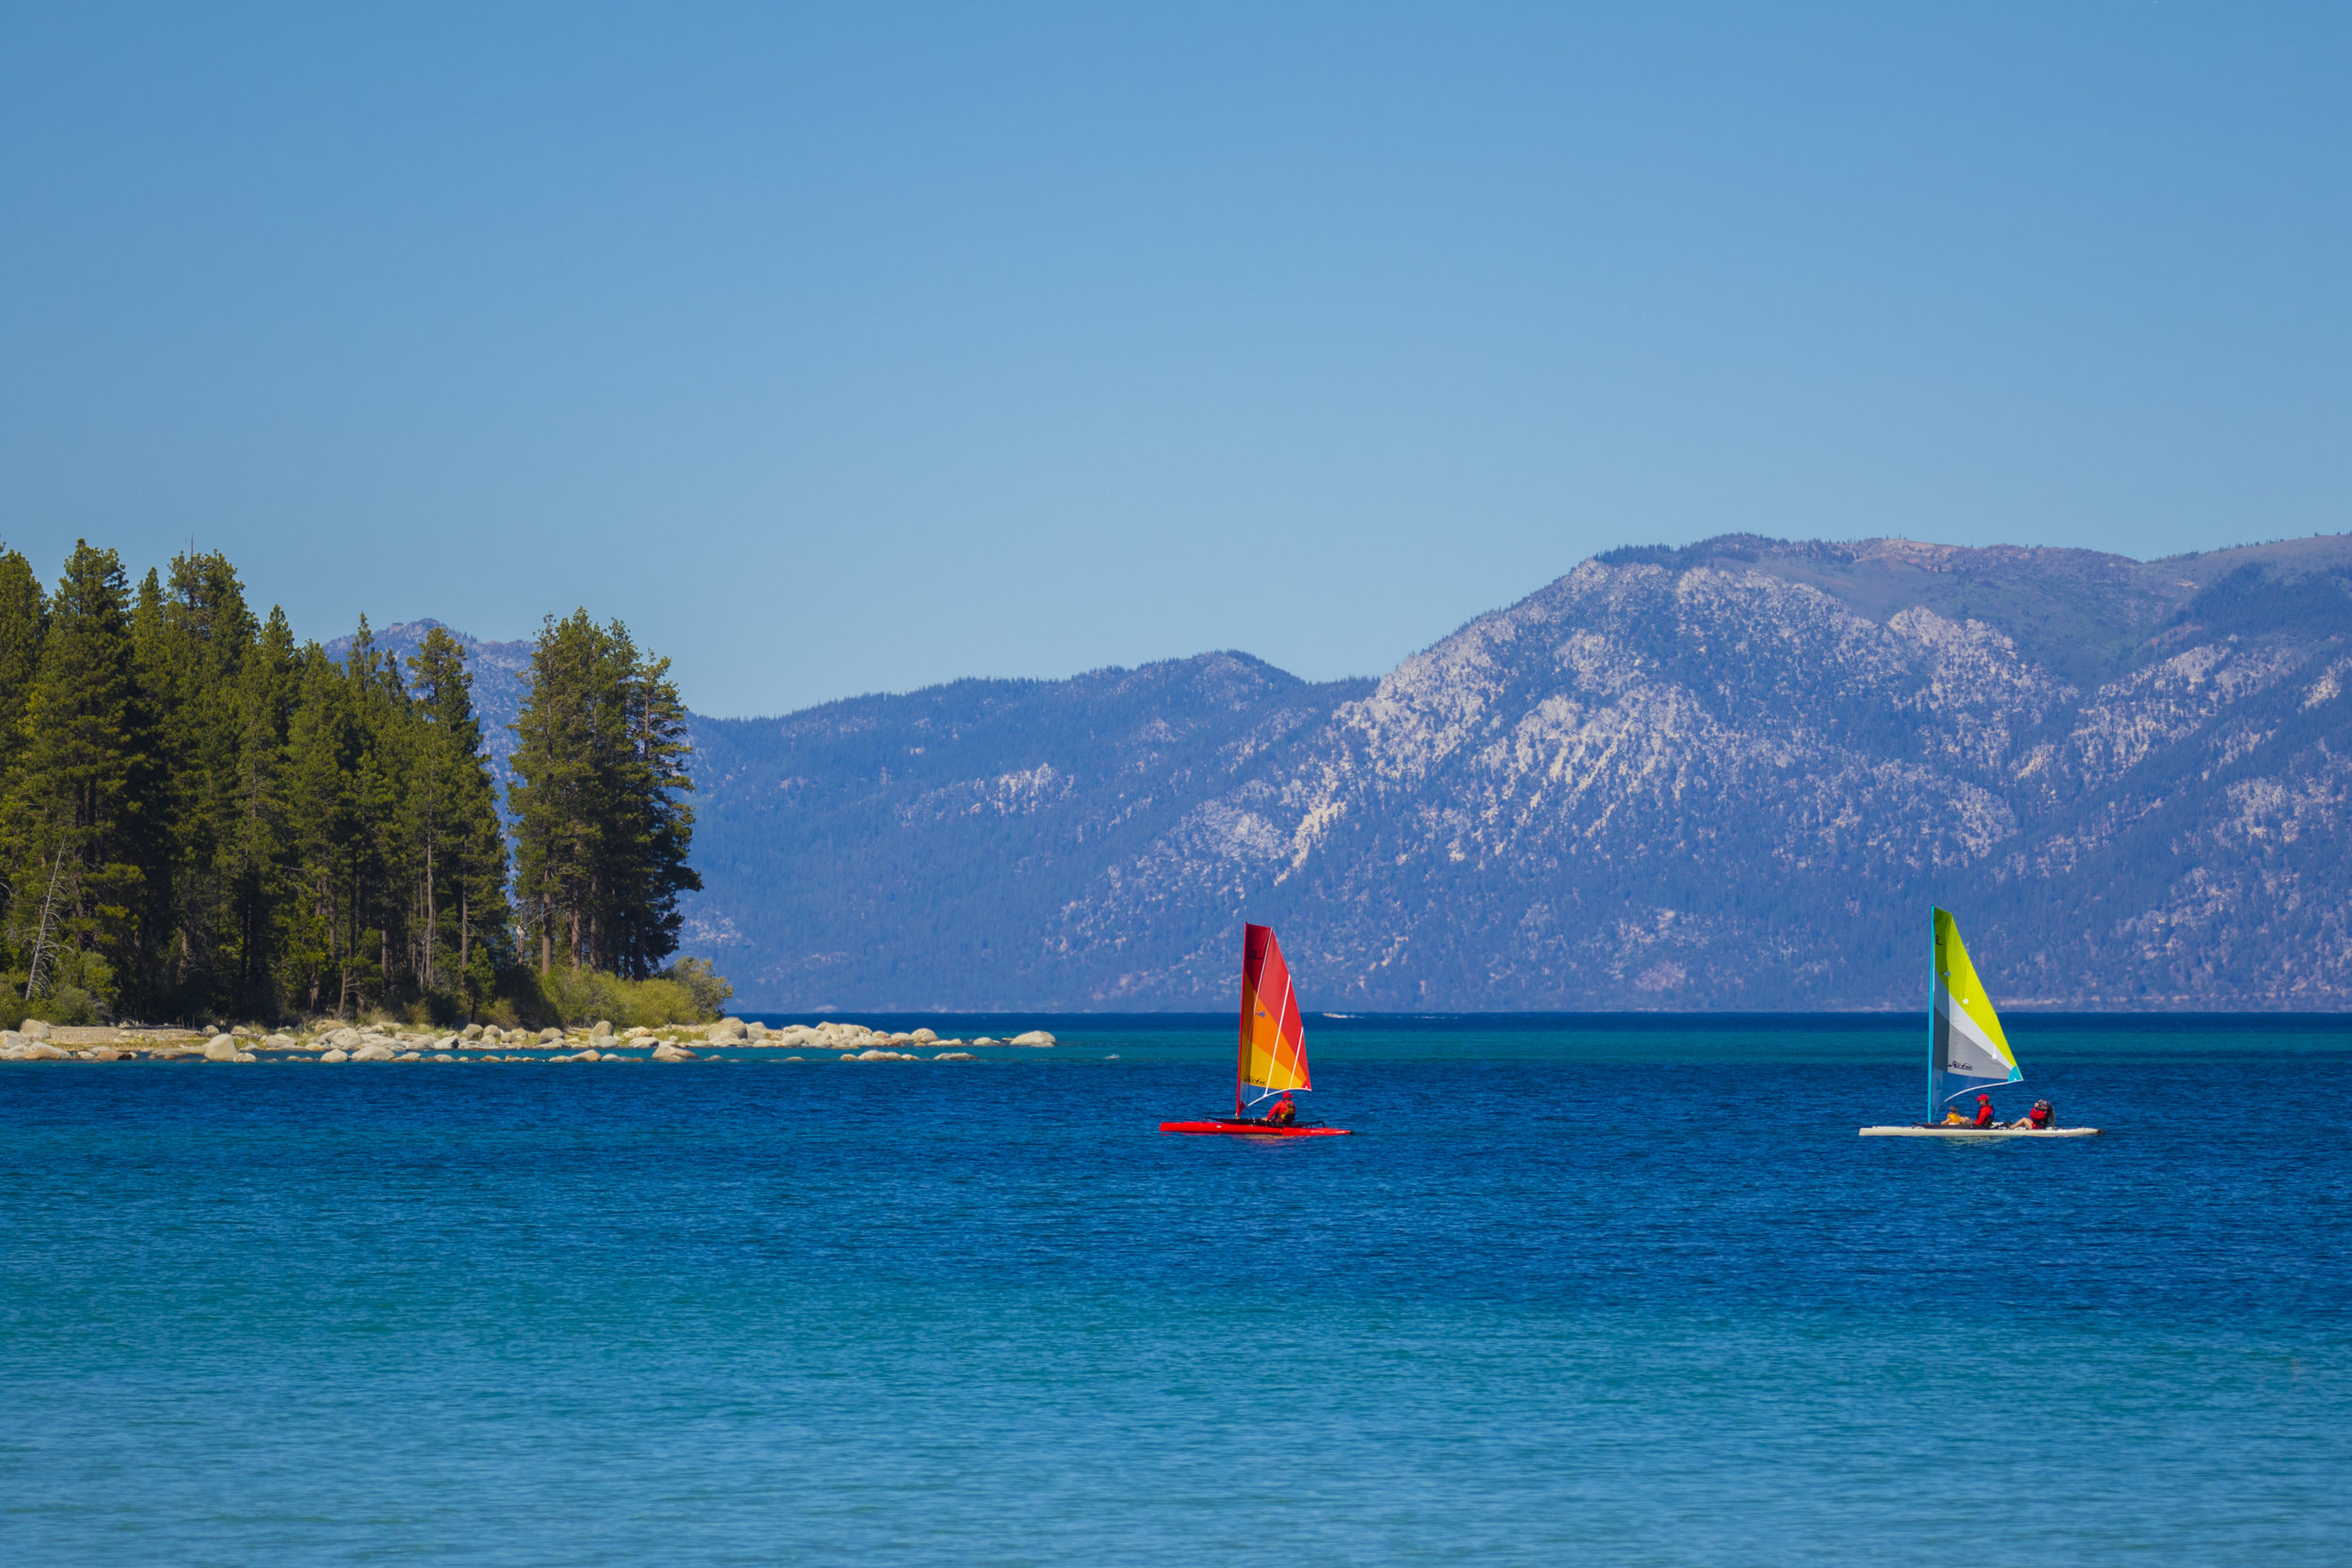 Islands_action_Tahoe_red_dune_rockyPoint_2327_full.jpg